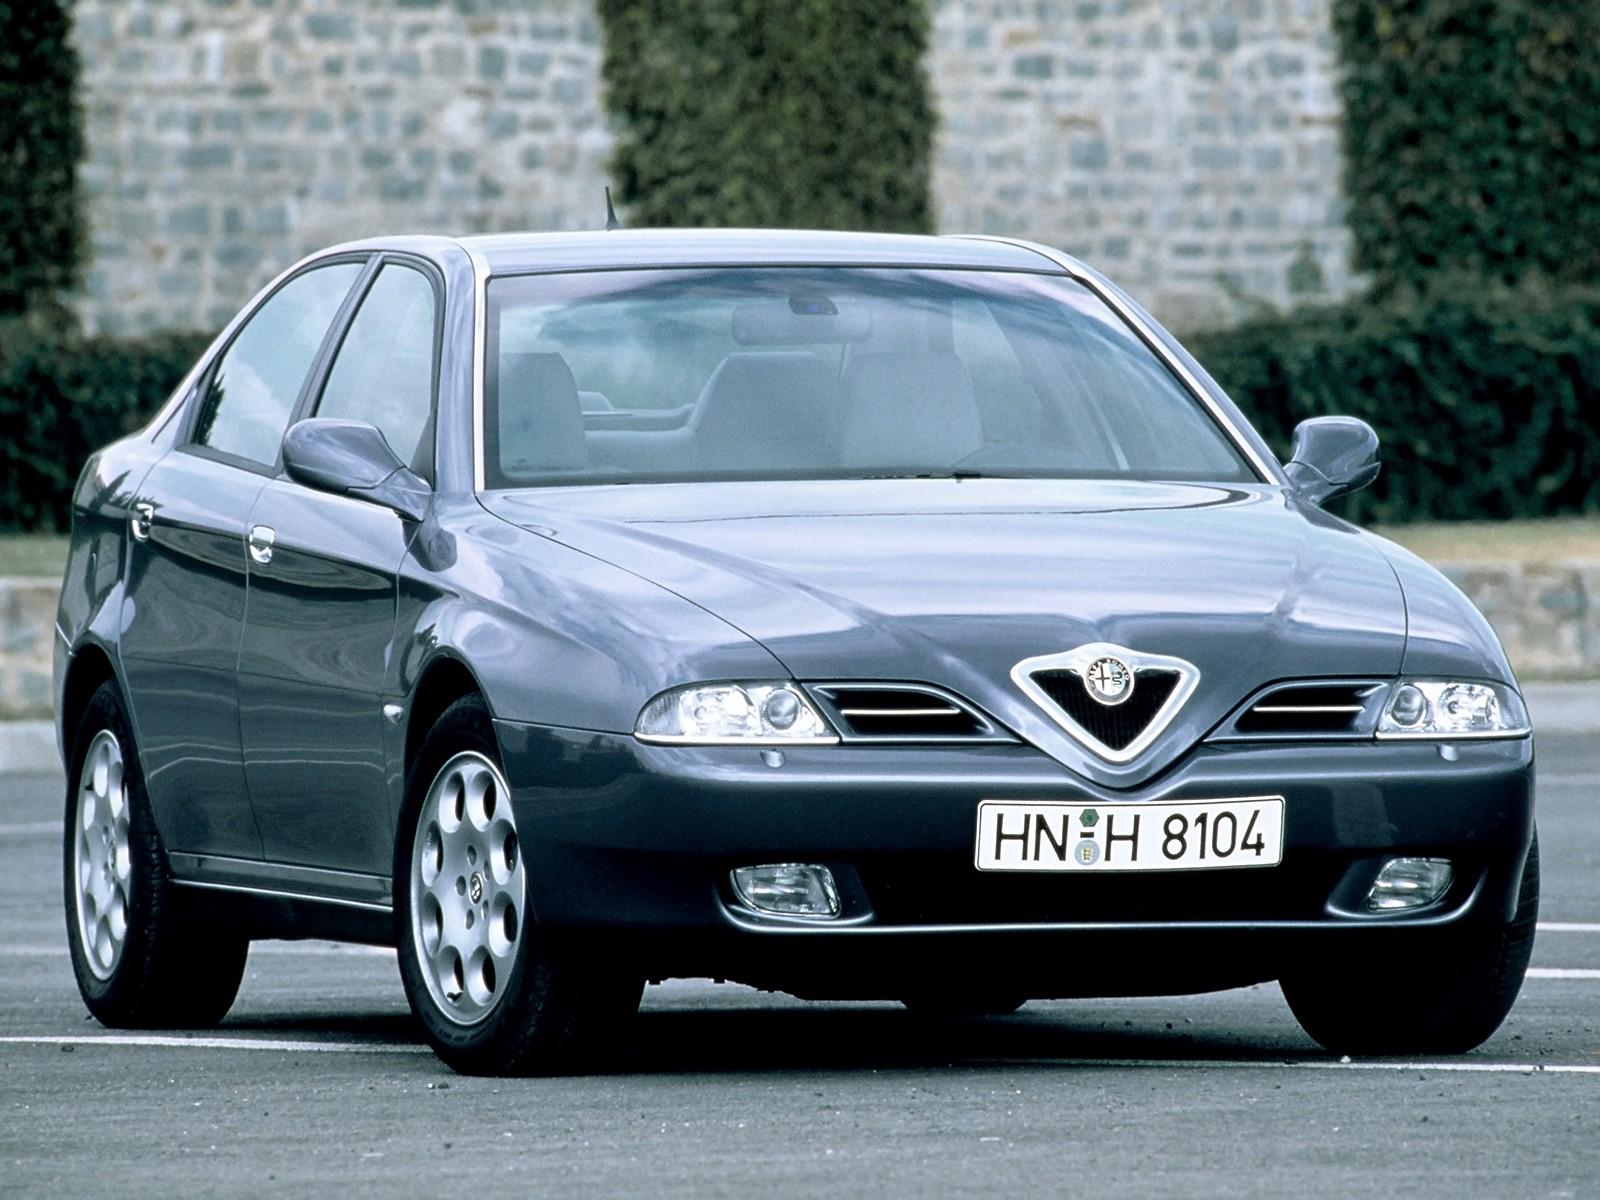 alfa romeo 166 specs 1998 1999 2000 2001 2002 2003 autoevolution. Black Bedroom Furniture Sets. Home Design Ideas